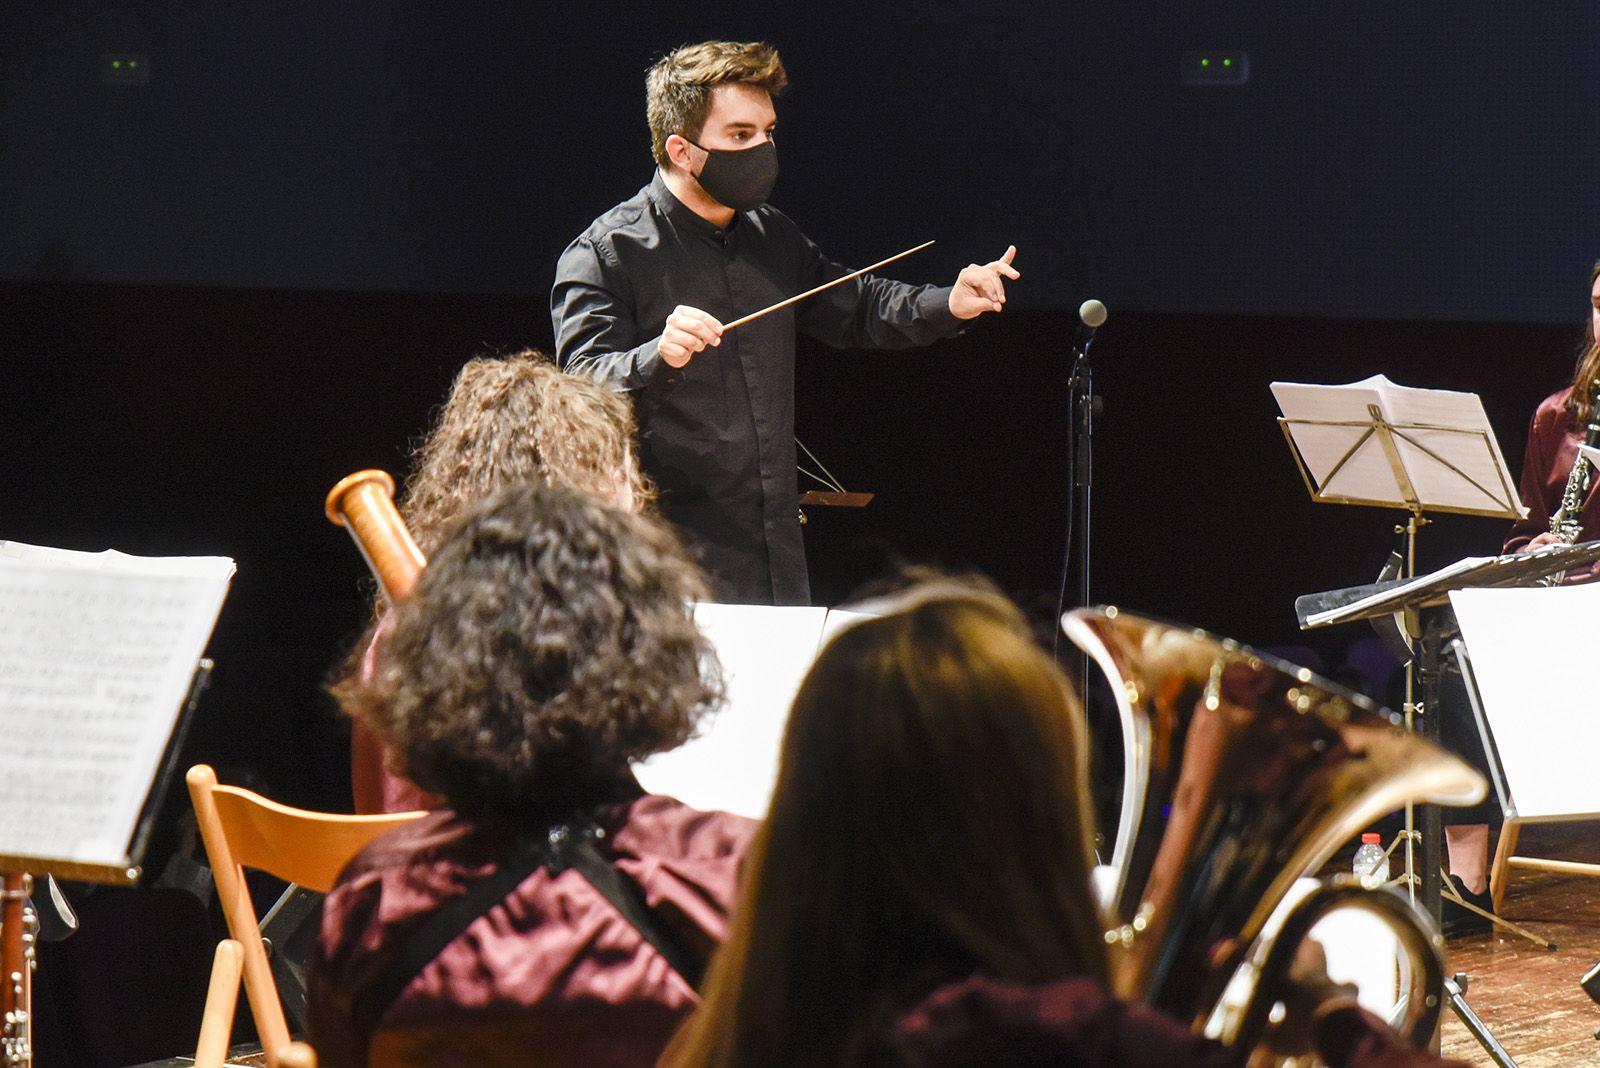 Concert Agrupació musical. Foto: Bernat Millet.